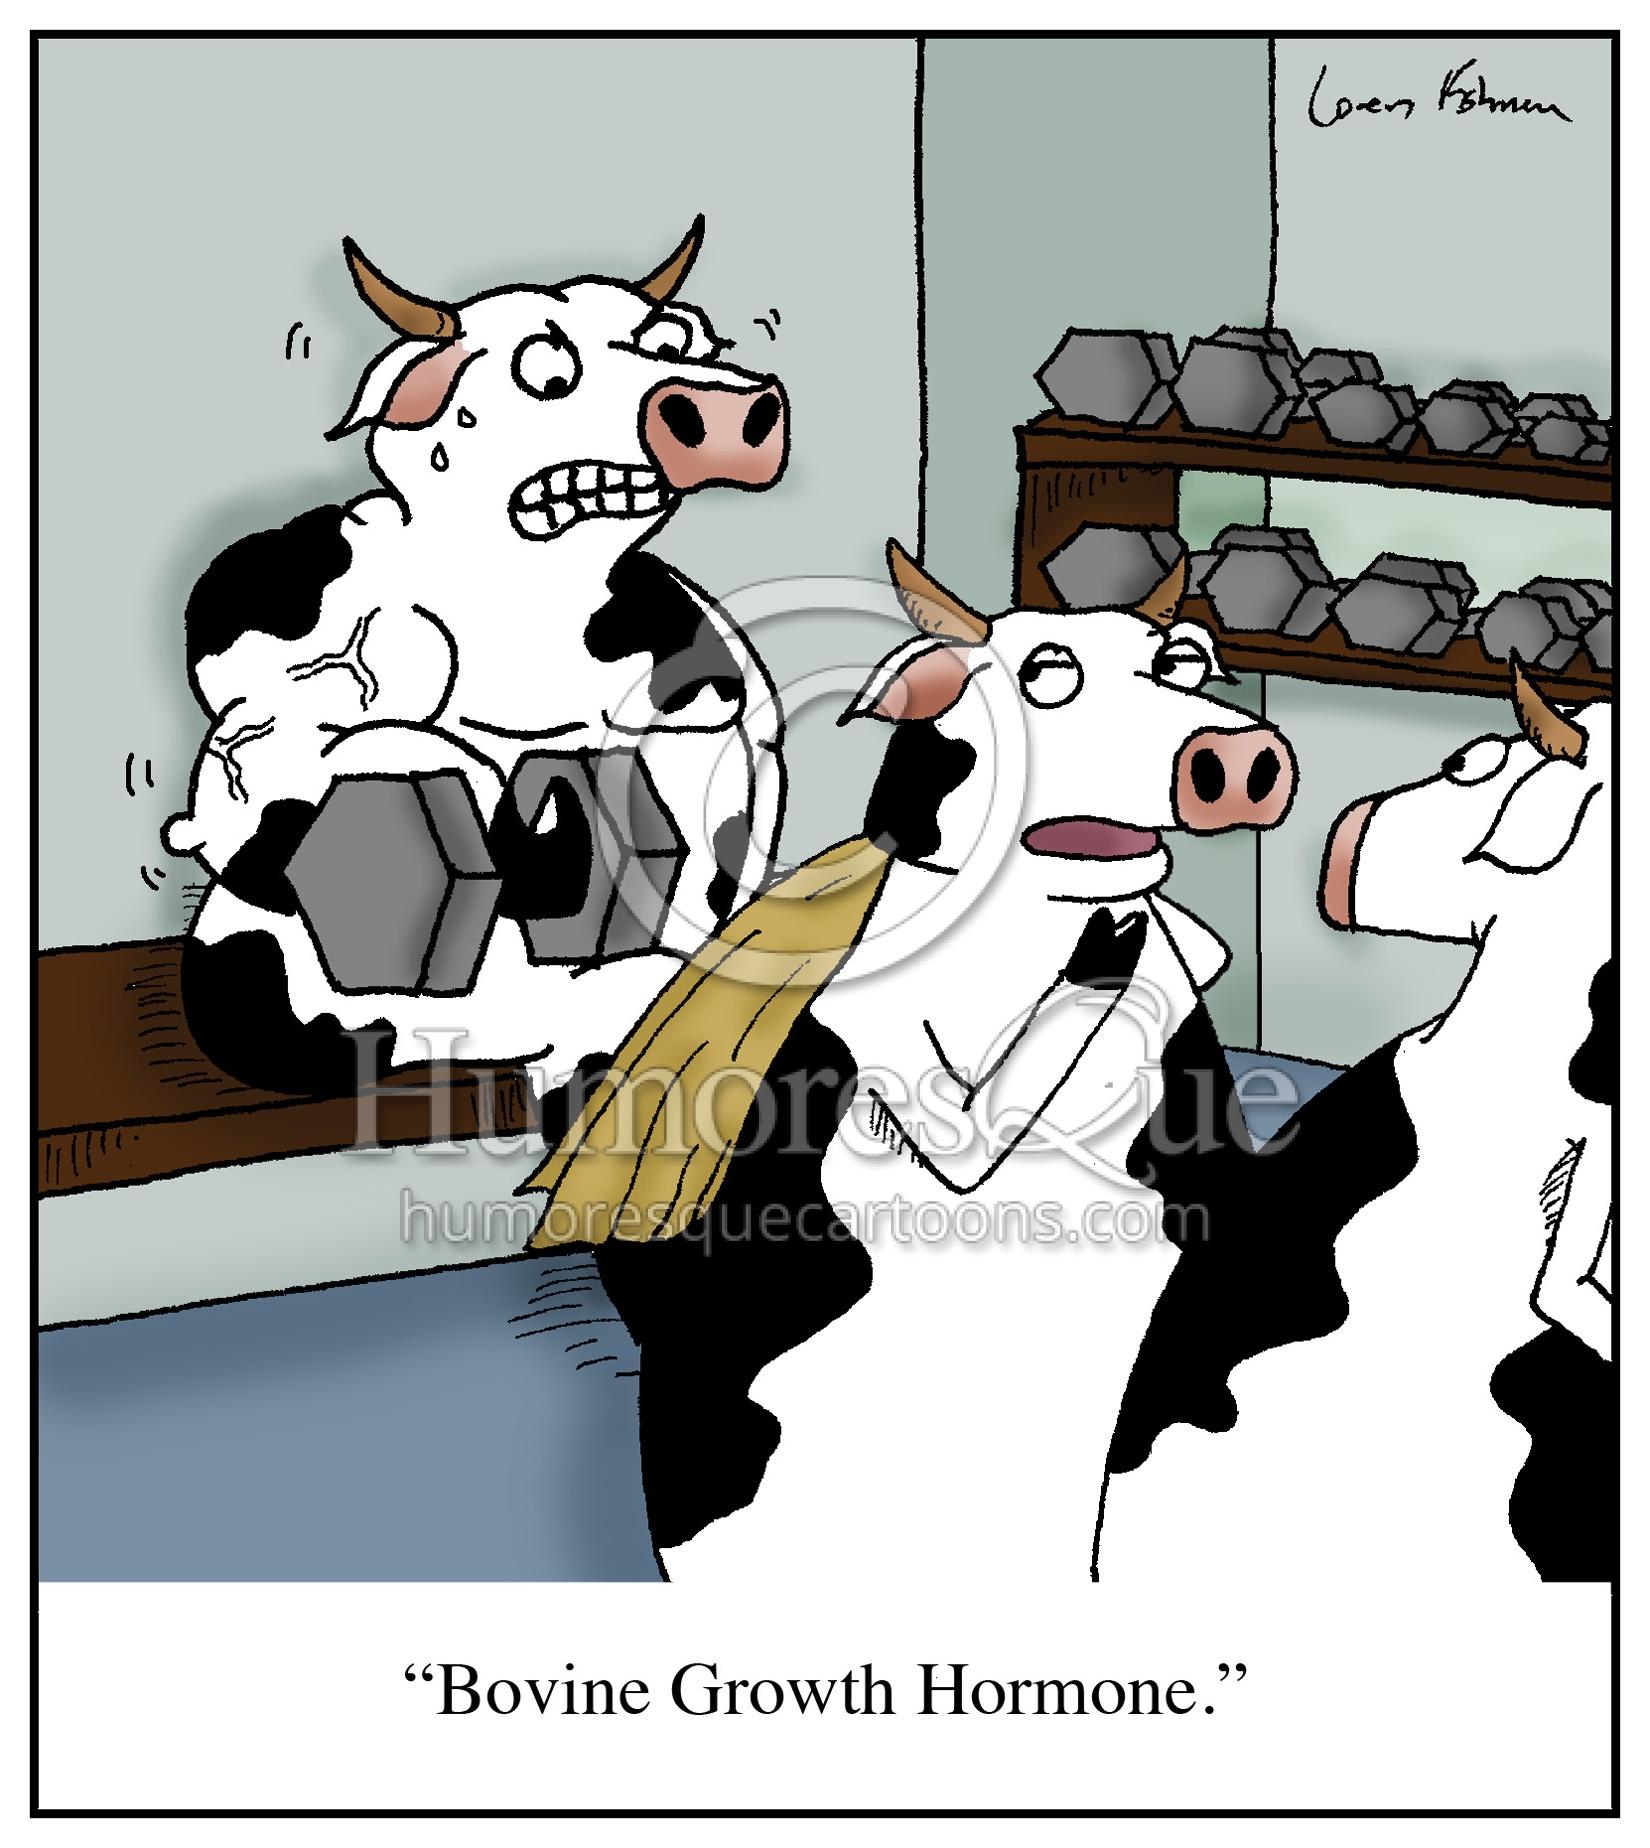 bovine growh hormone hgh bgh bodybuilding steroids cows cartoon